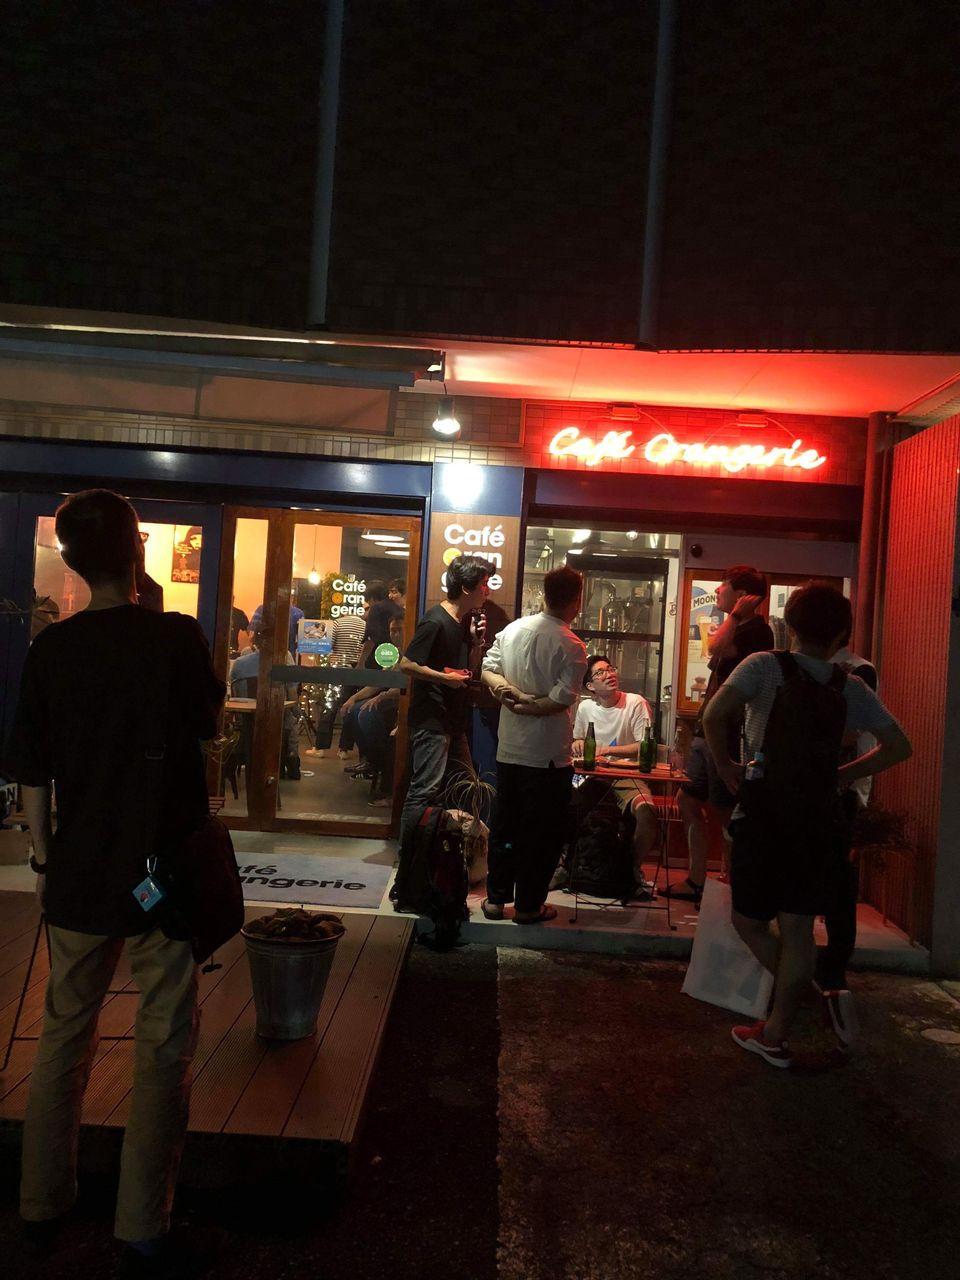 Cafe Orangerie_2514